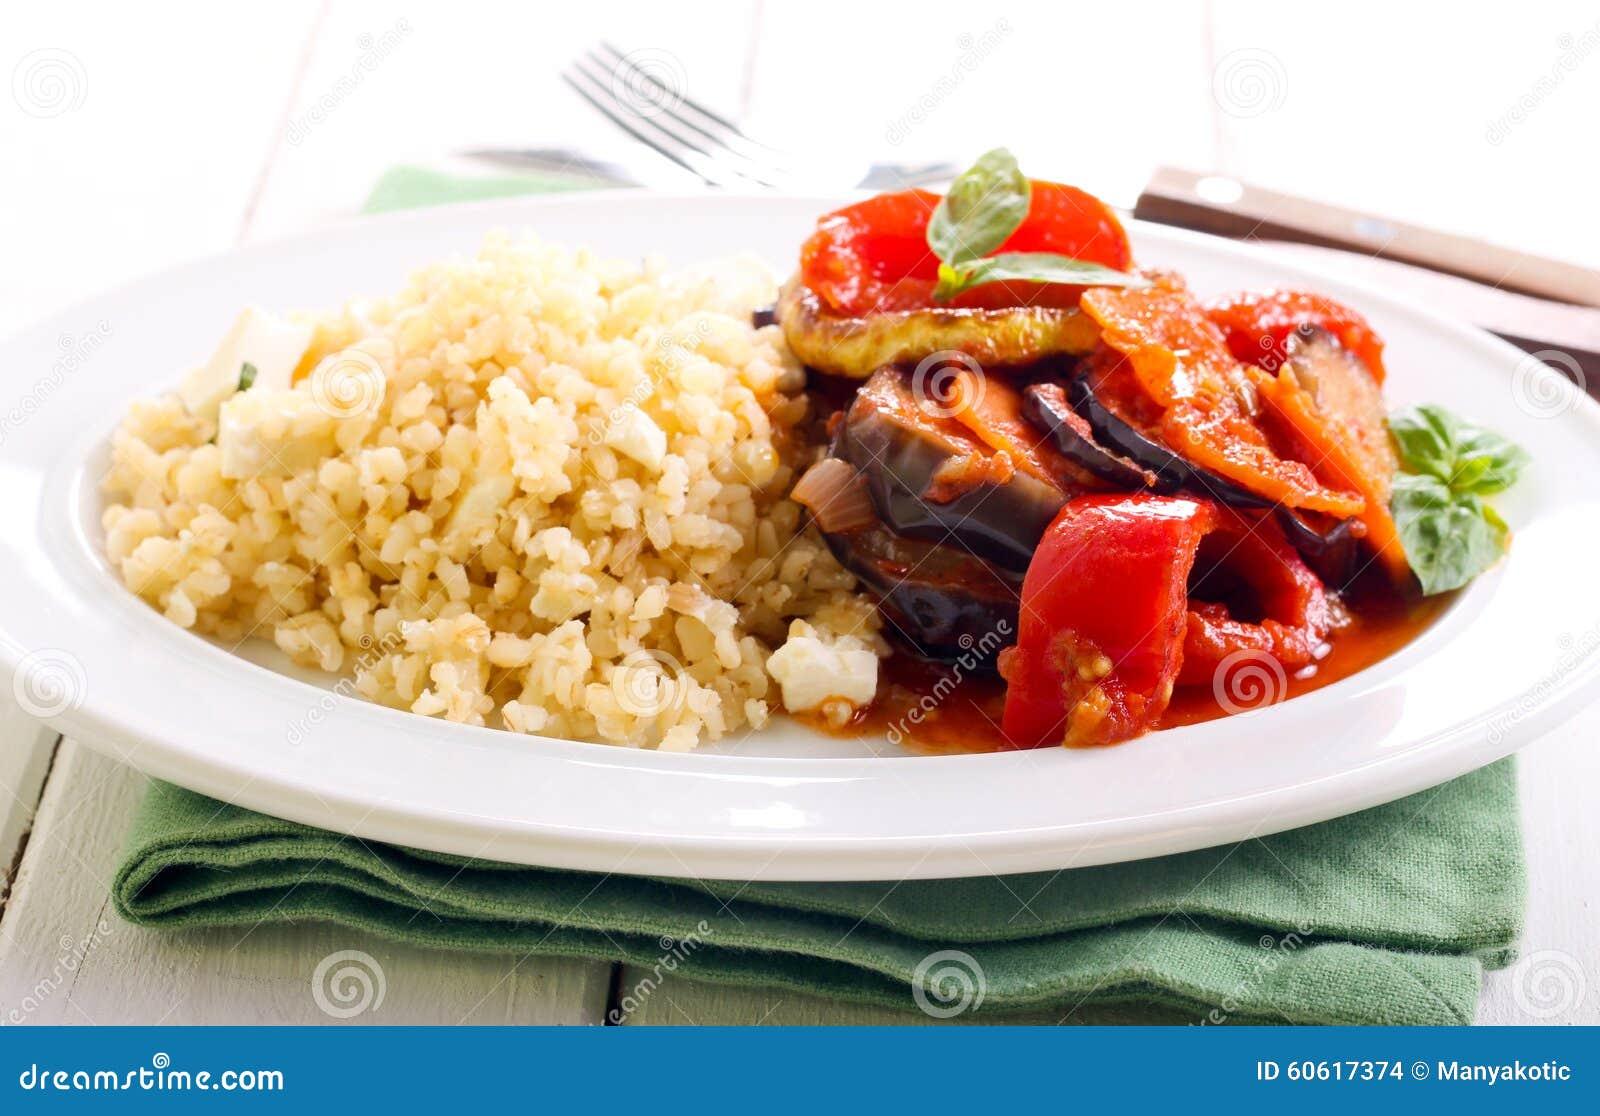 feta bulgur and ratatouille stock photo - image of aubergine